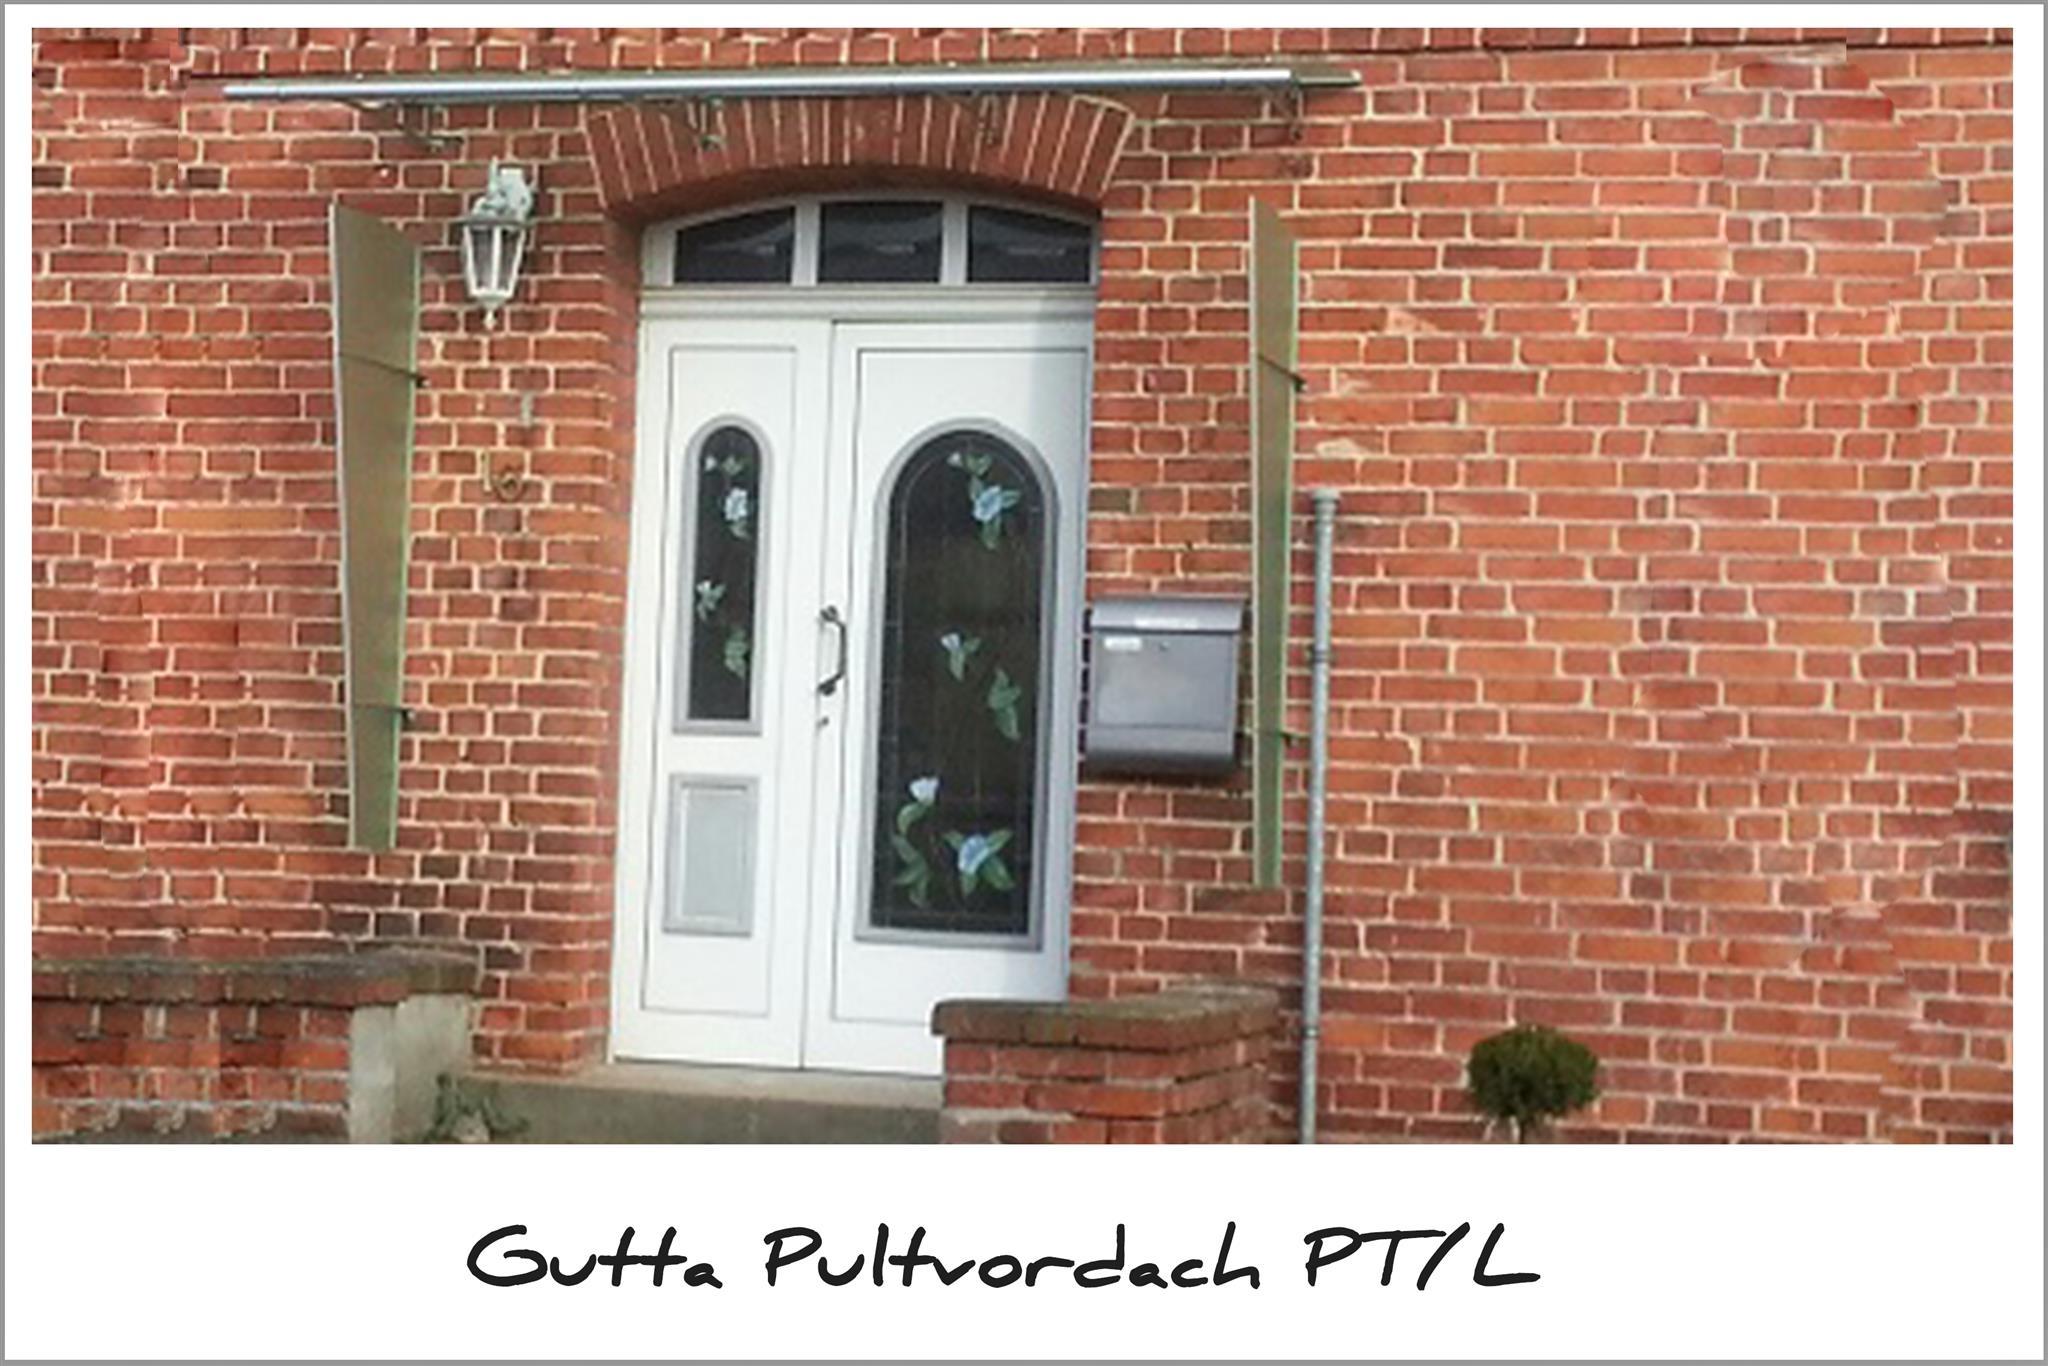 Gutta Pultvordach PT/L